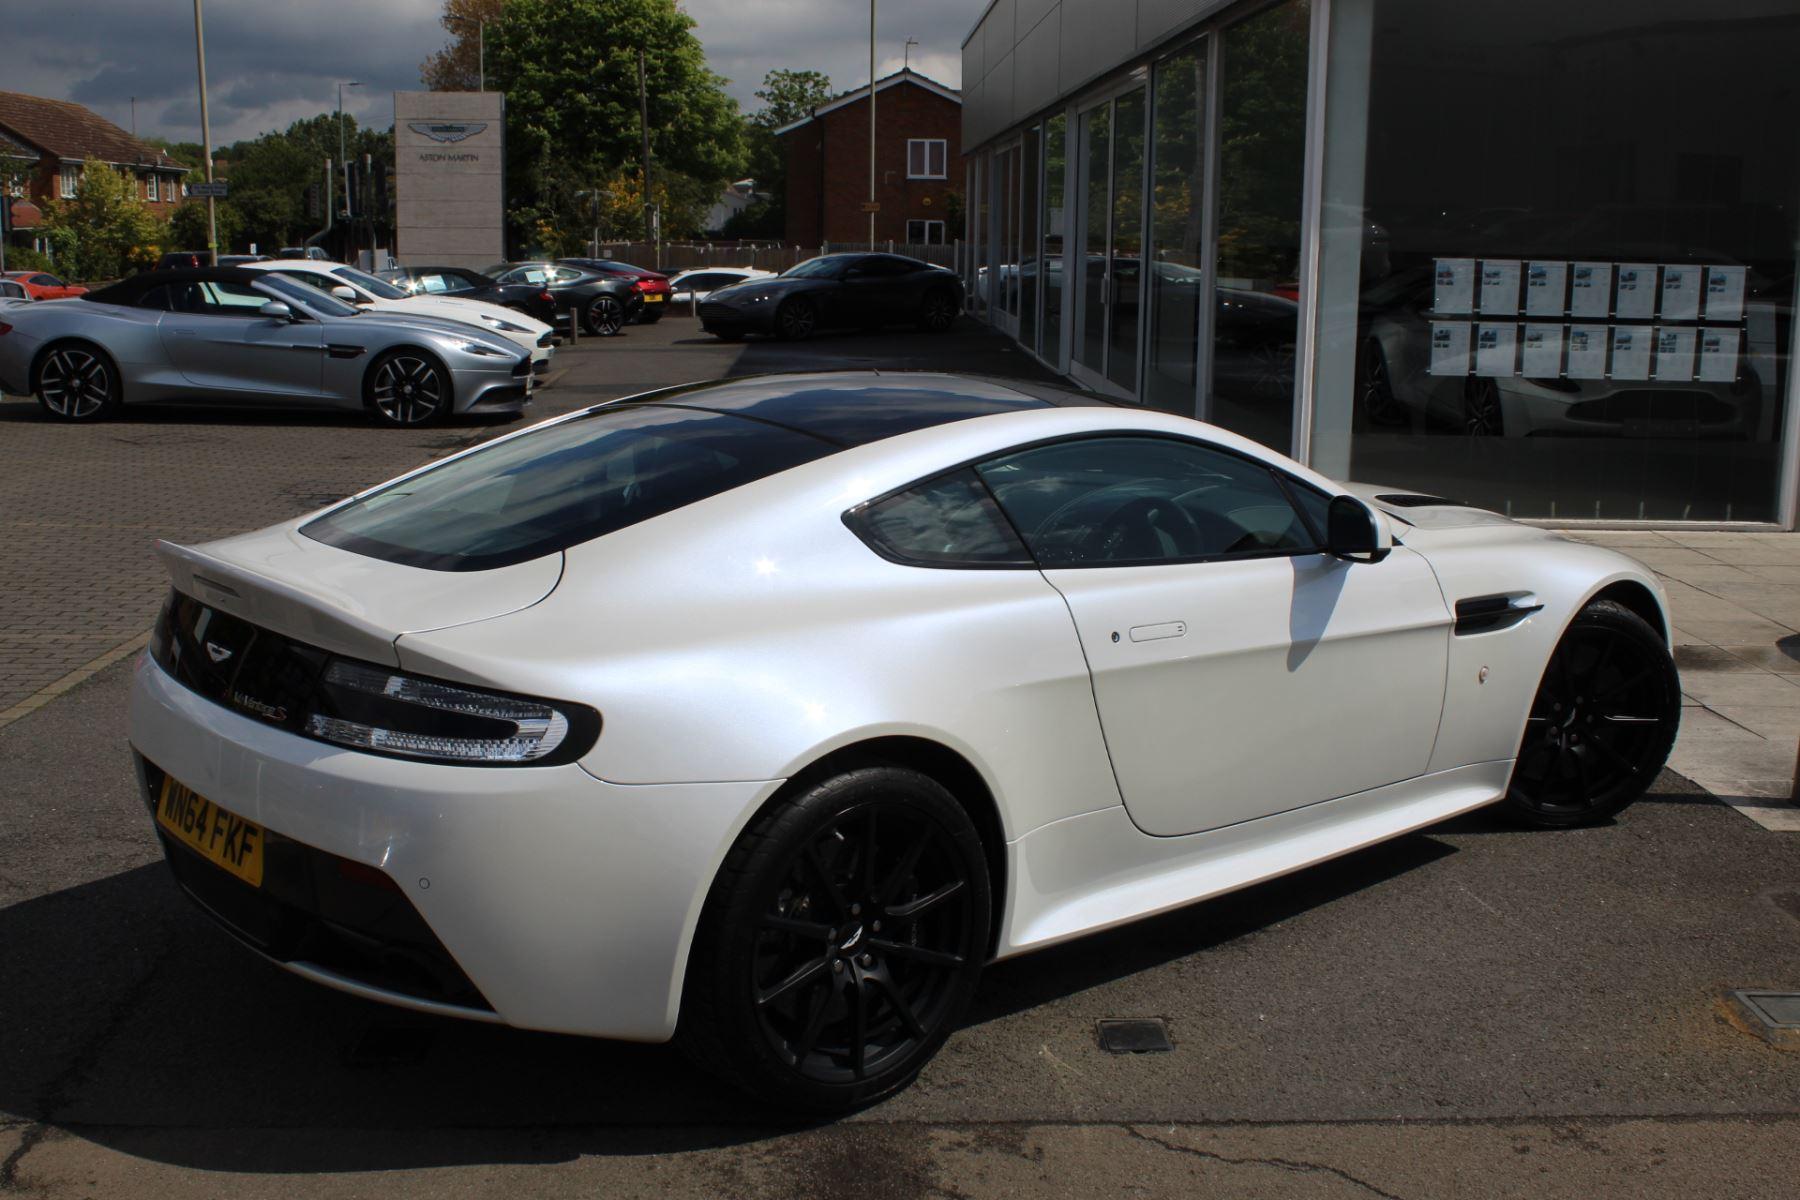 Aston Martin V12 Vantage S Coupe S 2dr Sportshift III image 19